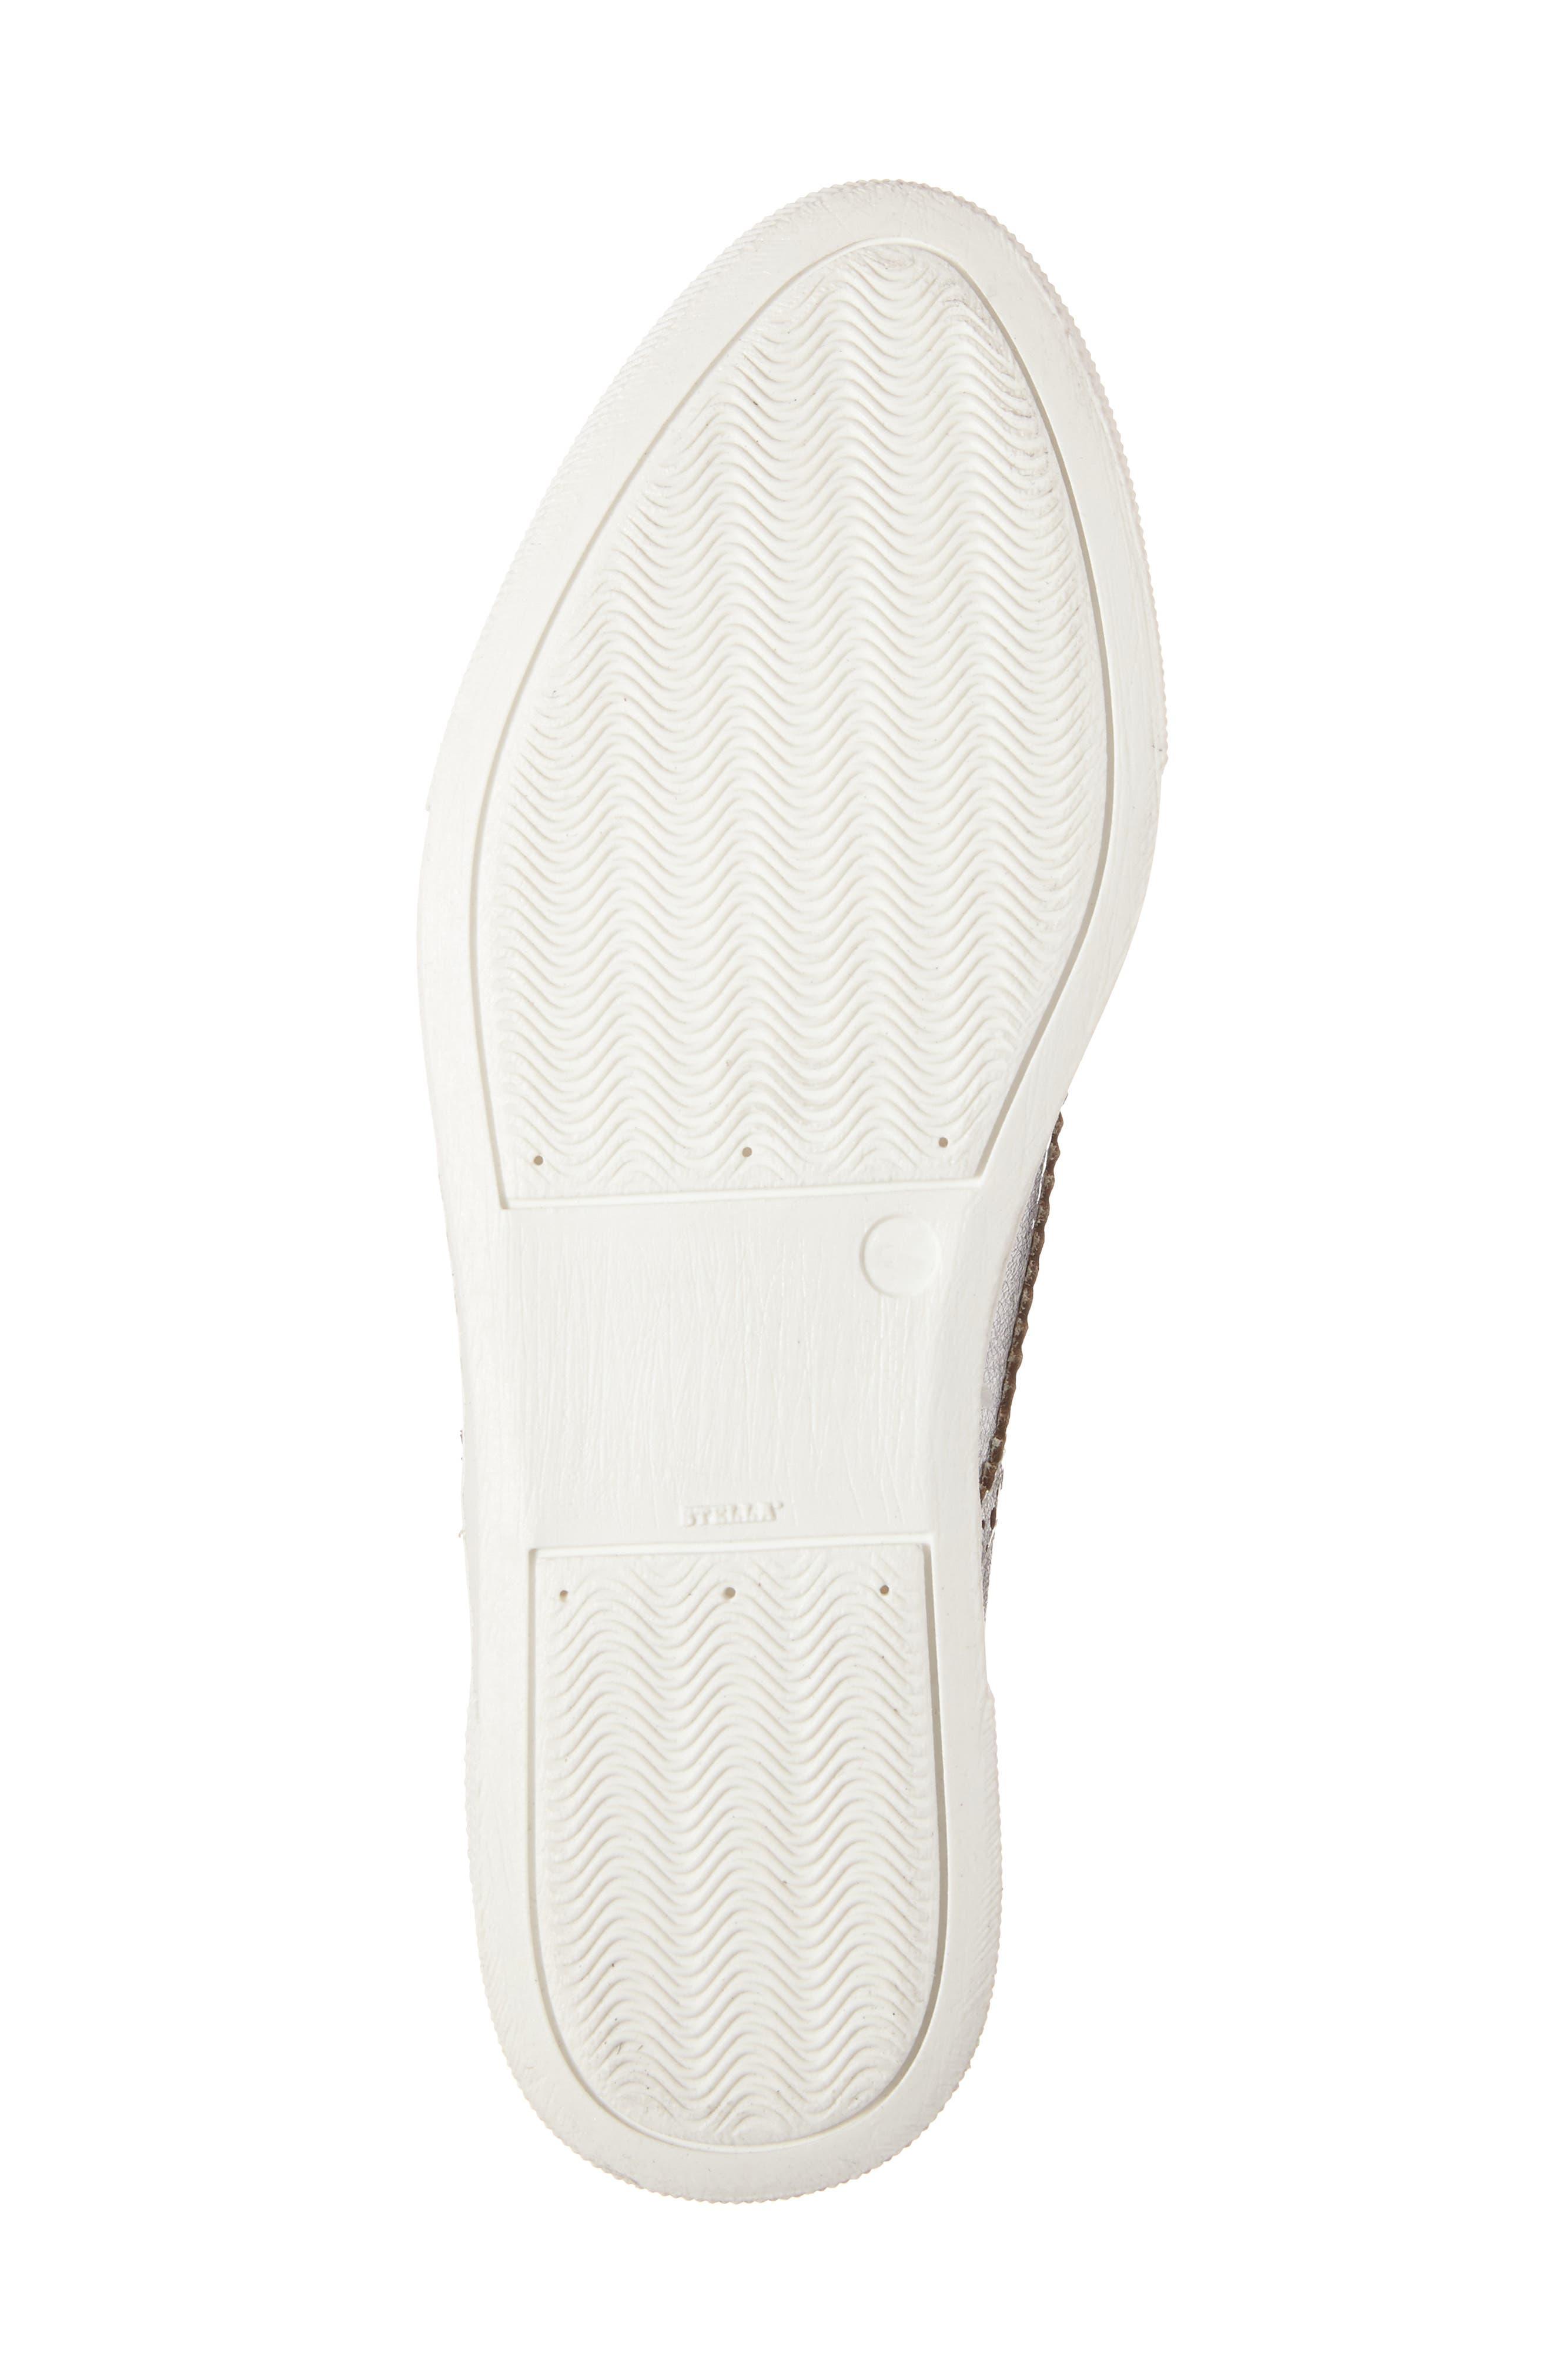 Kimmie Perforated Platform Sneaker,                             Alternate thumbnail 14, color,